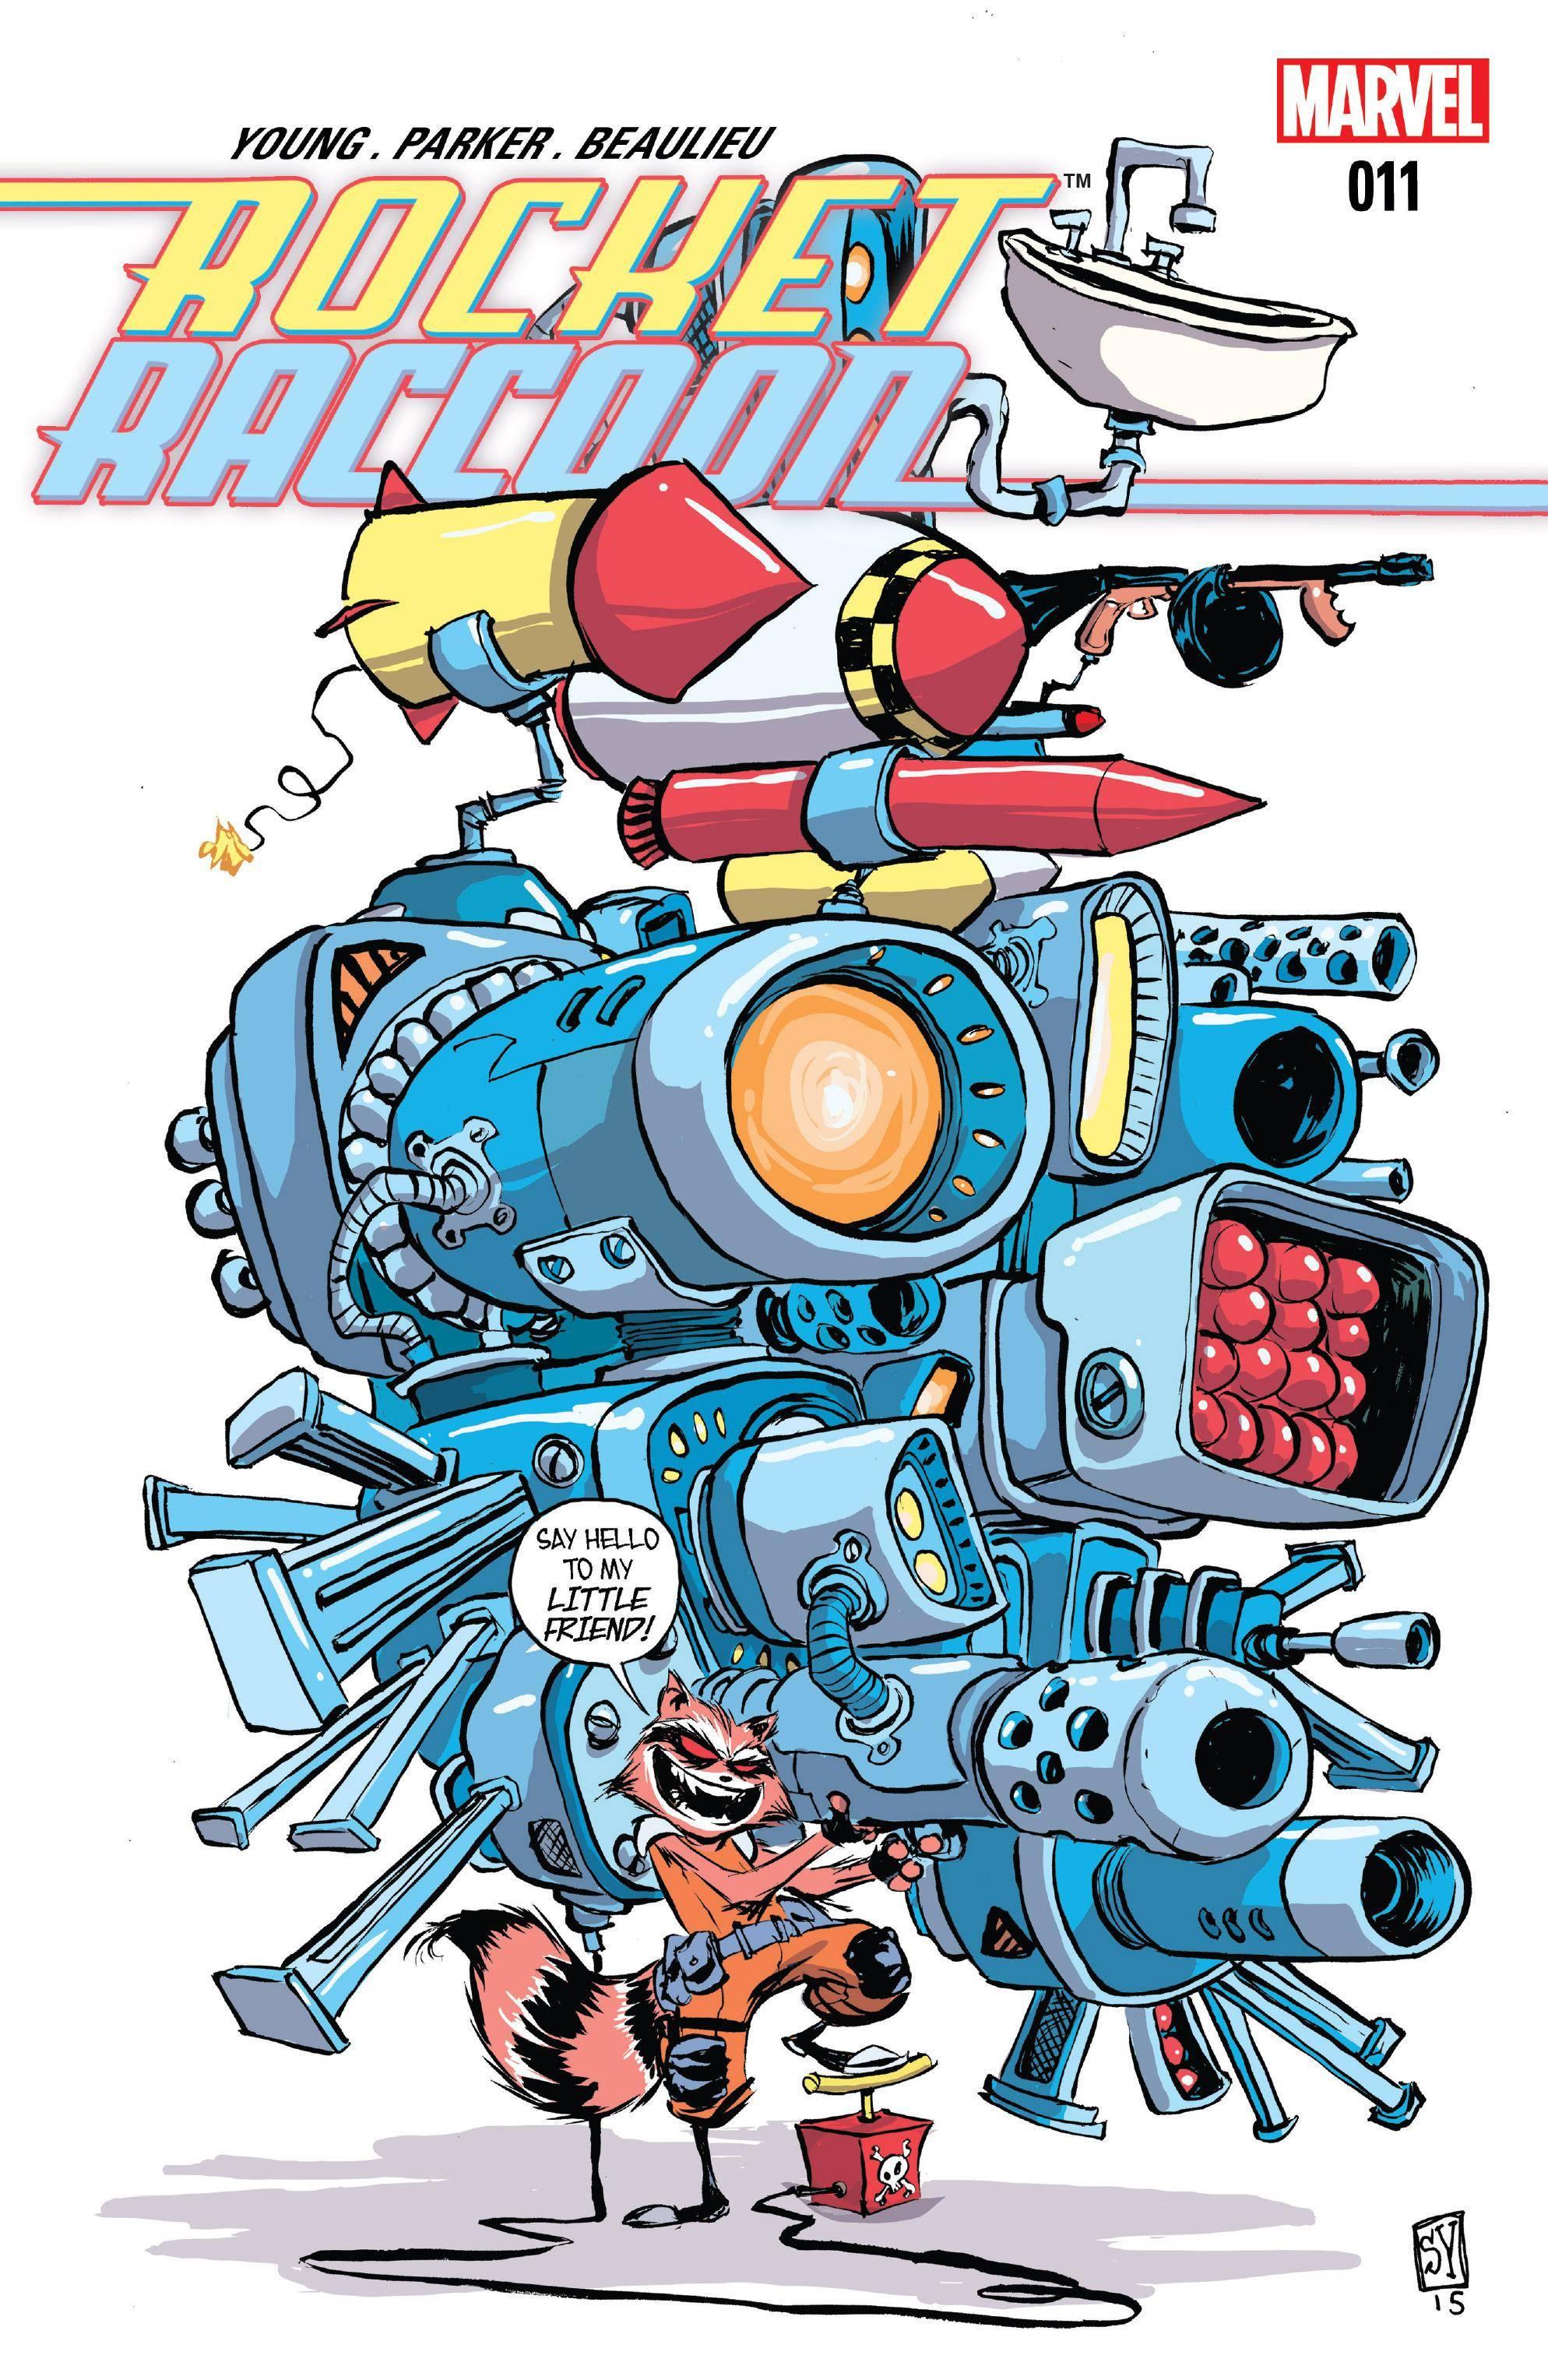 0-Day 2015 5 6 - Rocket Raccoon 011 2015 Digital Zone-Empire cbr